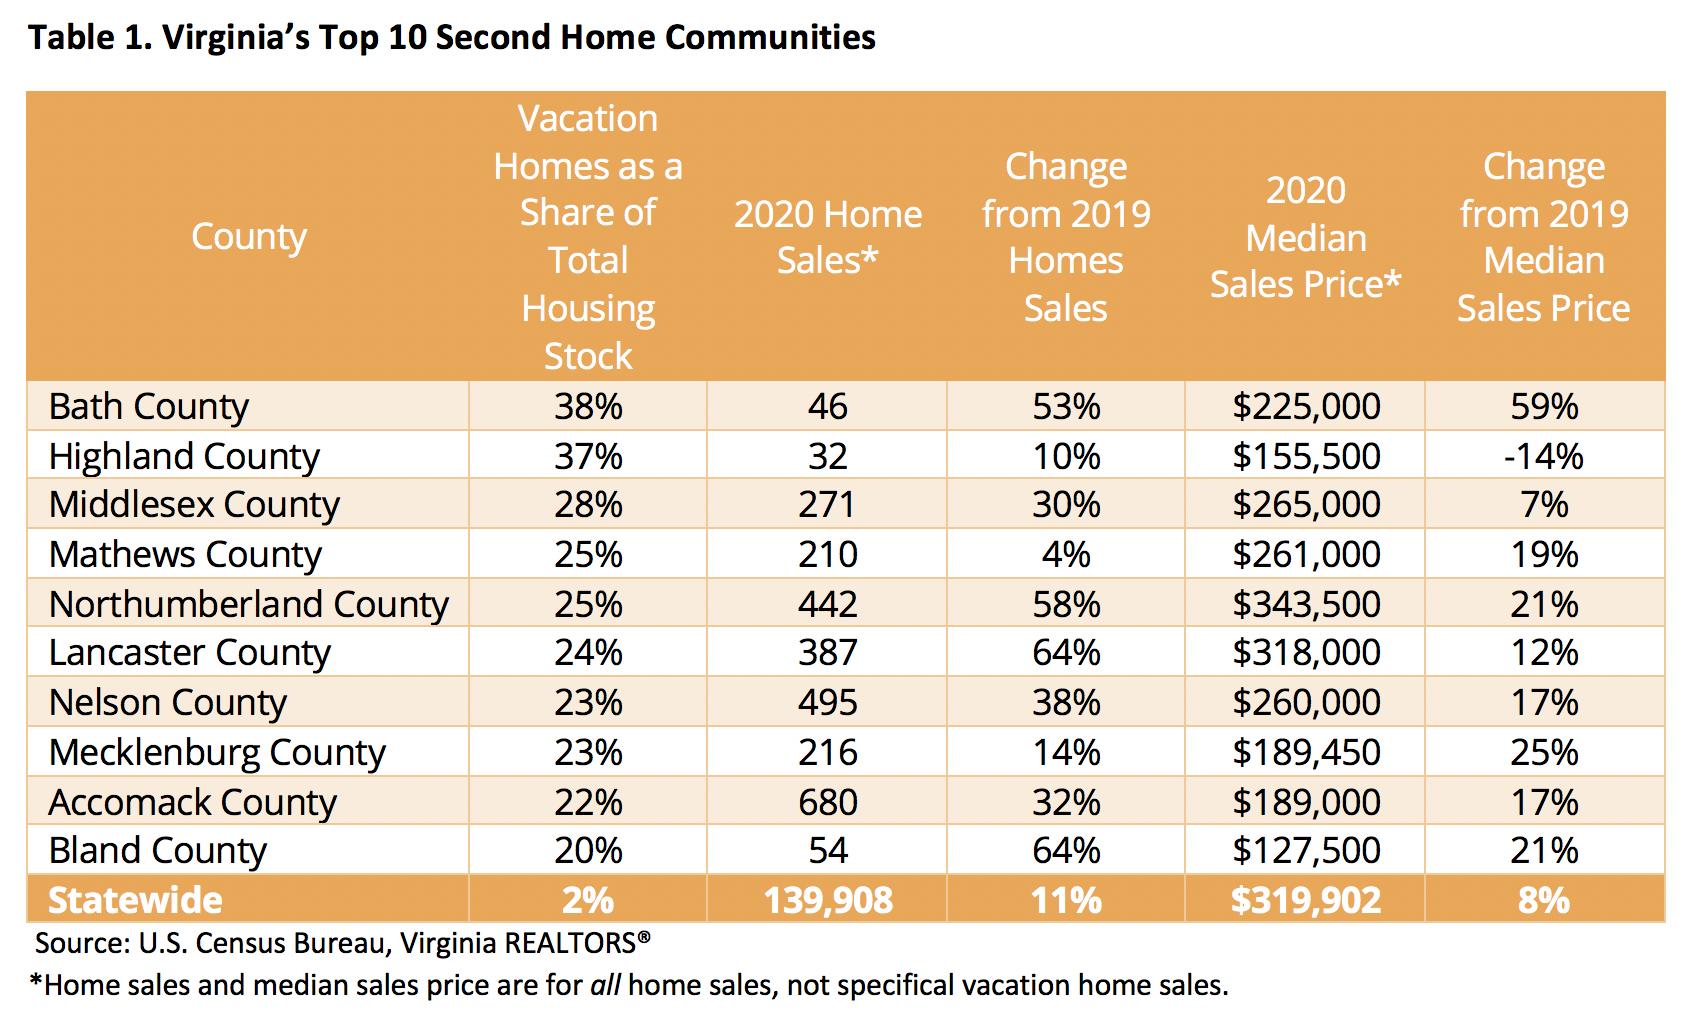 Top 10 Second Home Communities